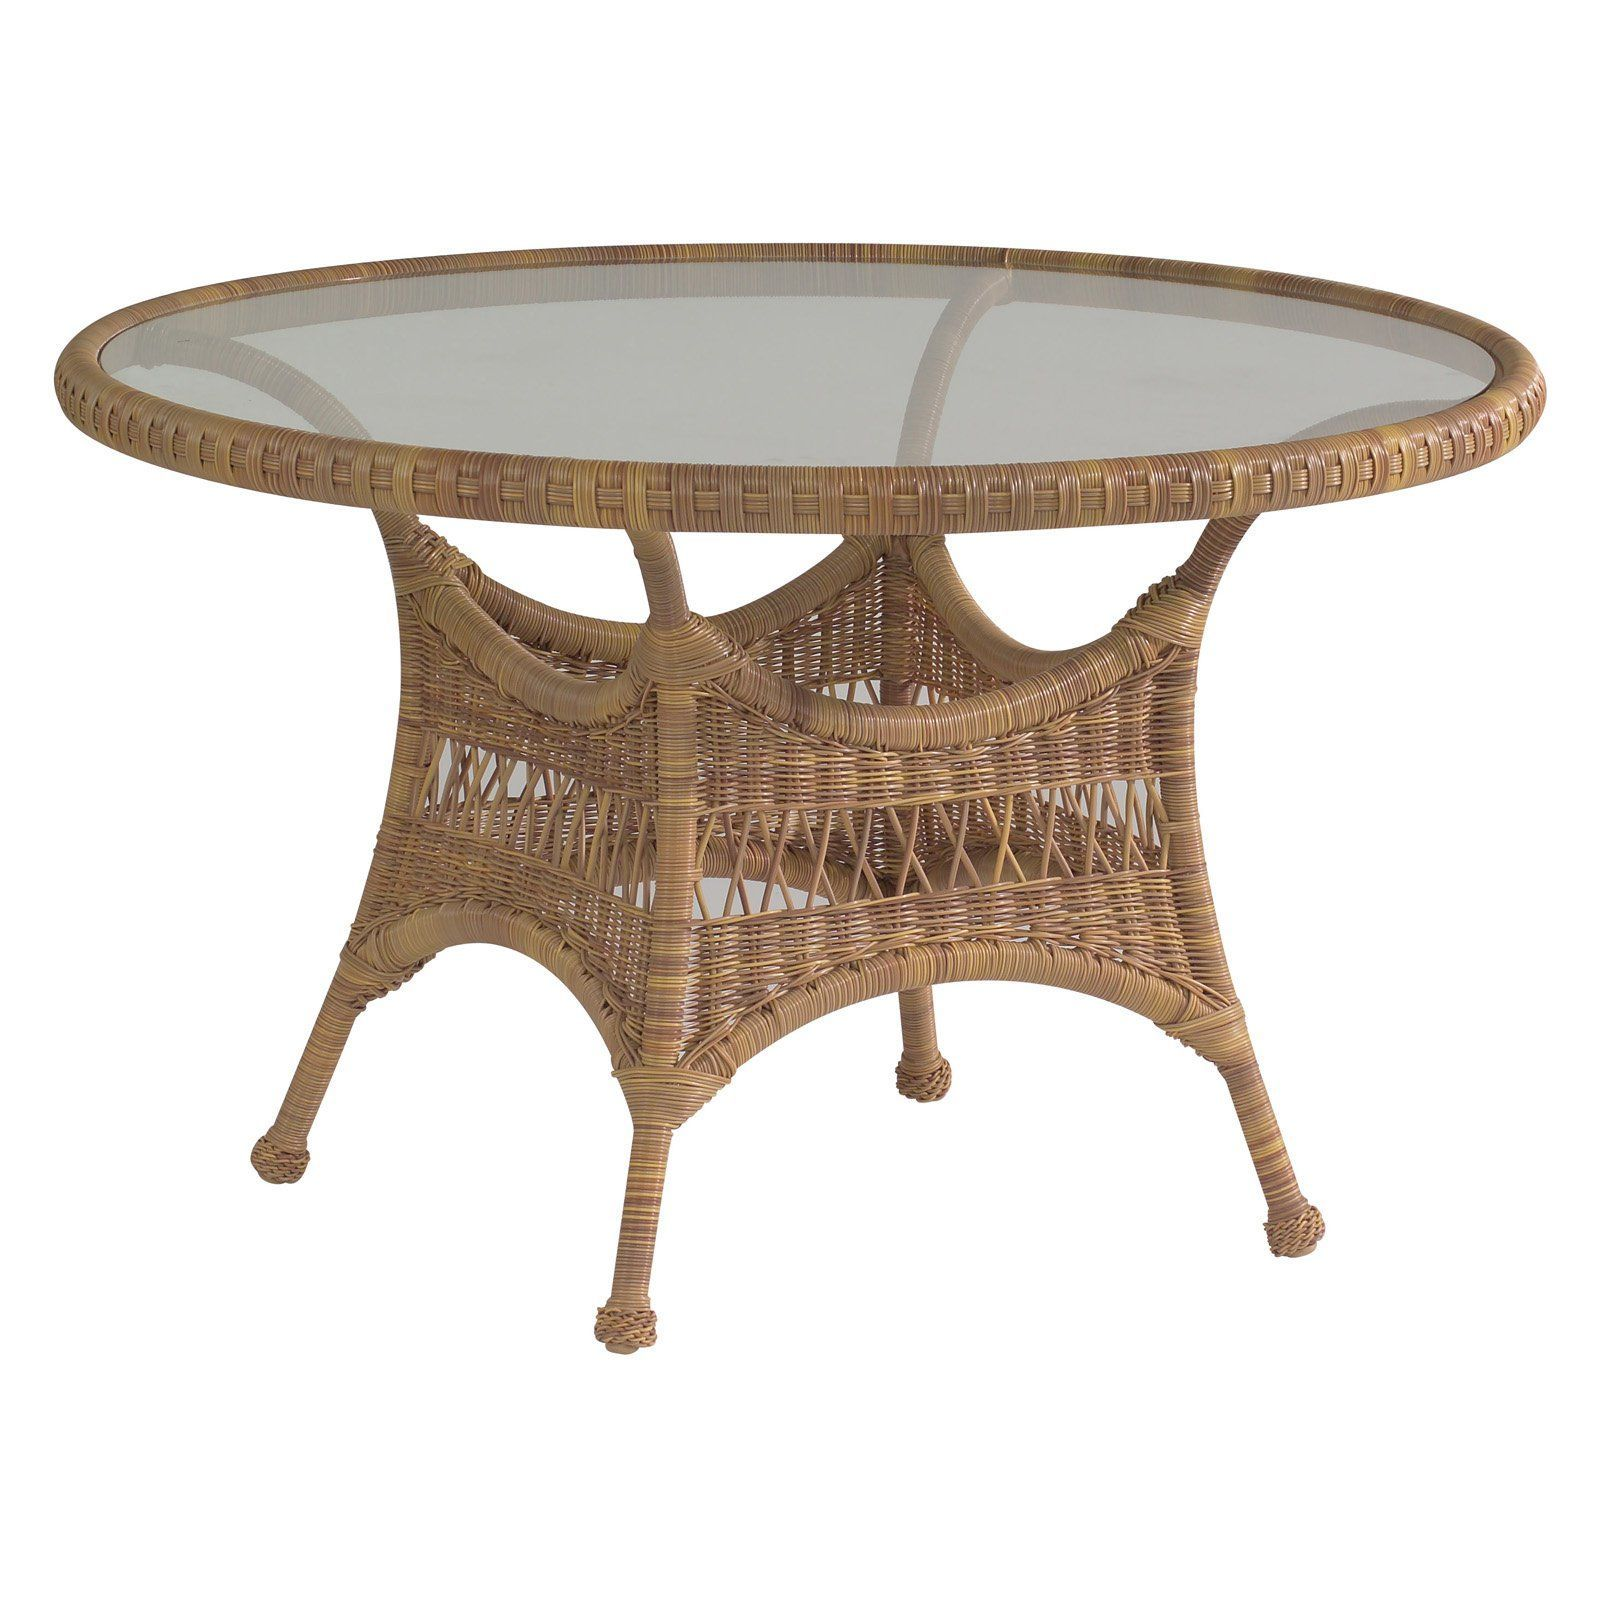 50+ Small Patio Table with Umbrella Hole Diy Modern